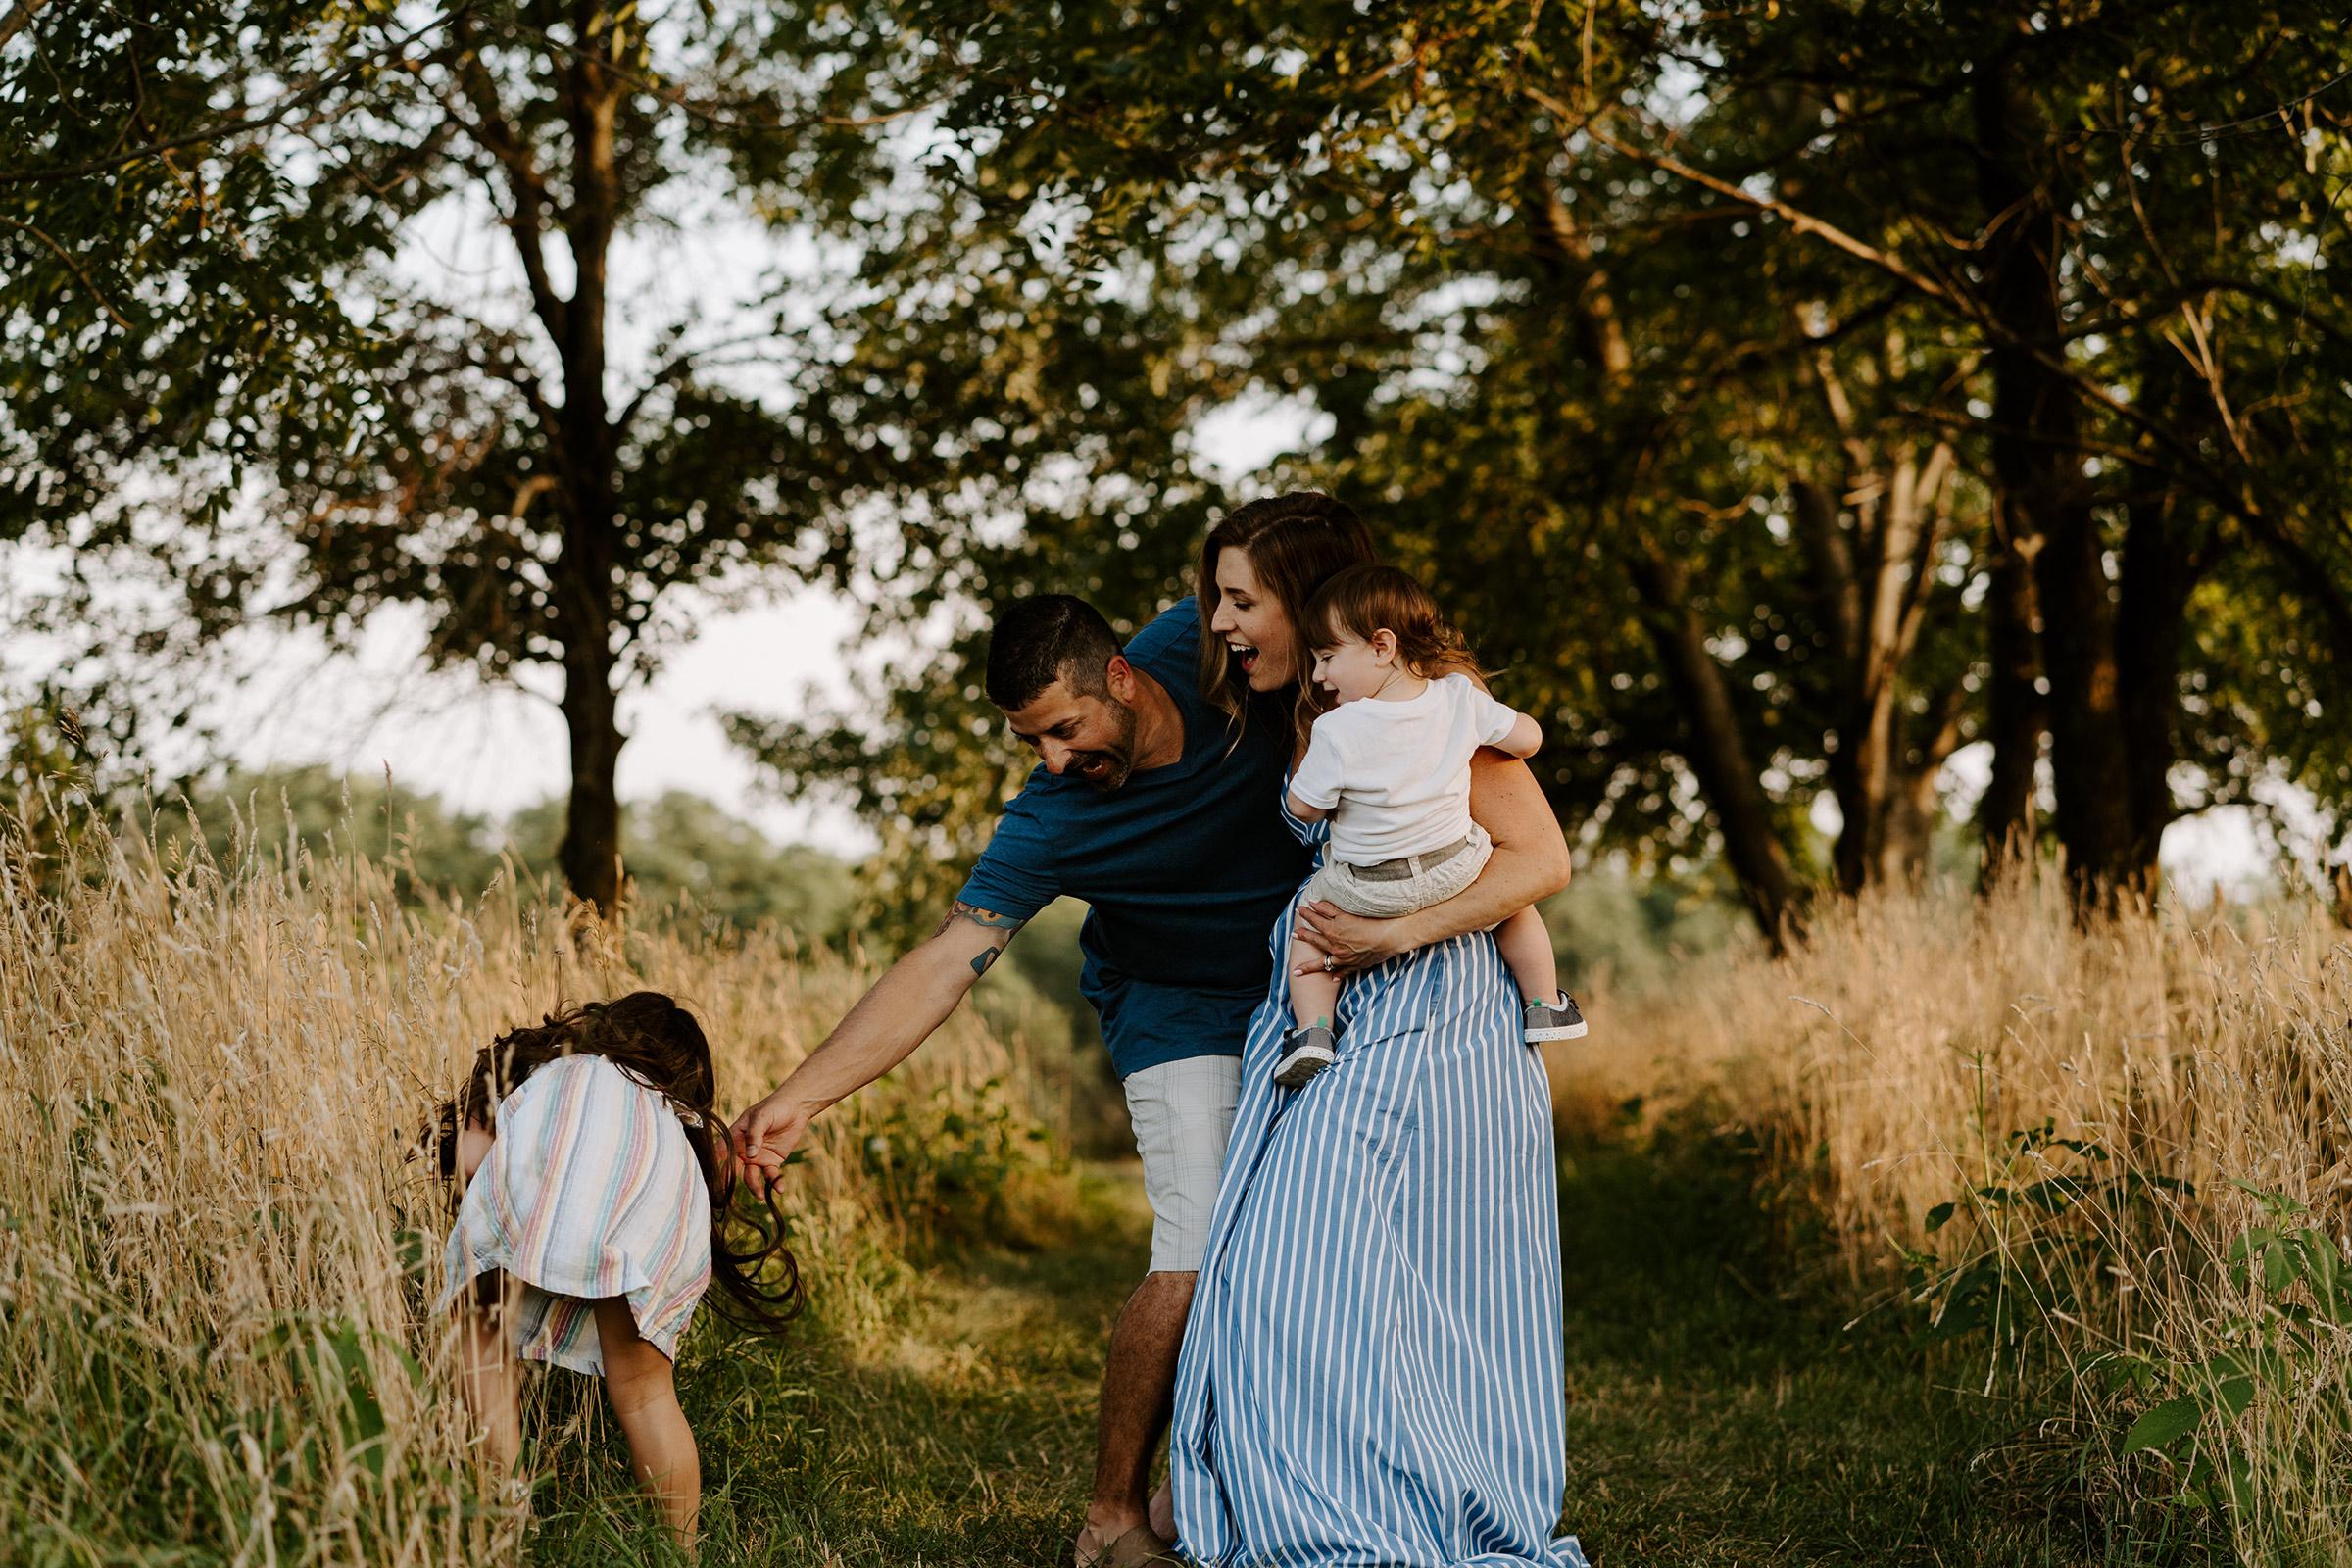 natale-family-chasing-daughter-around-at-iris-aisle--winterset-iowa-raelyn-ramey-photography-158.jpg